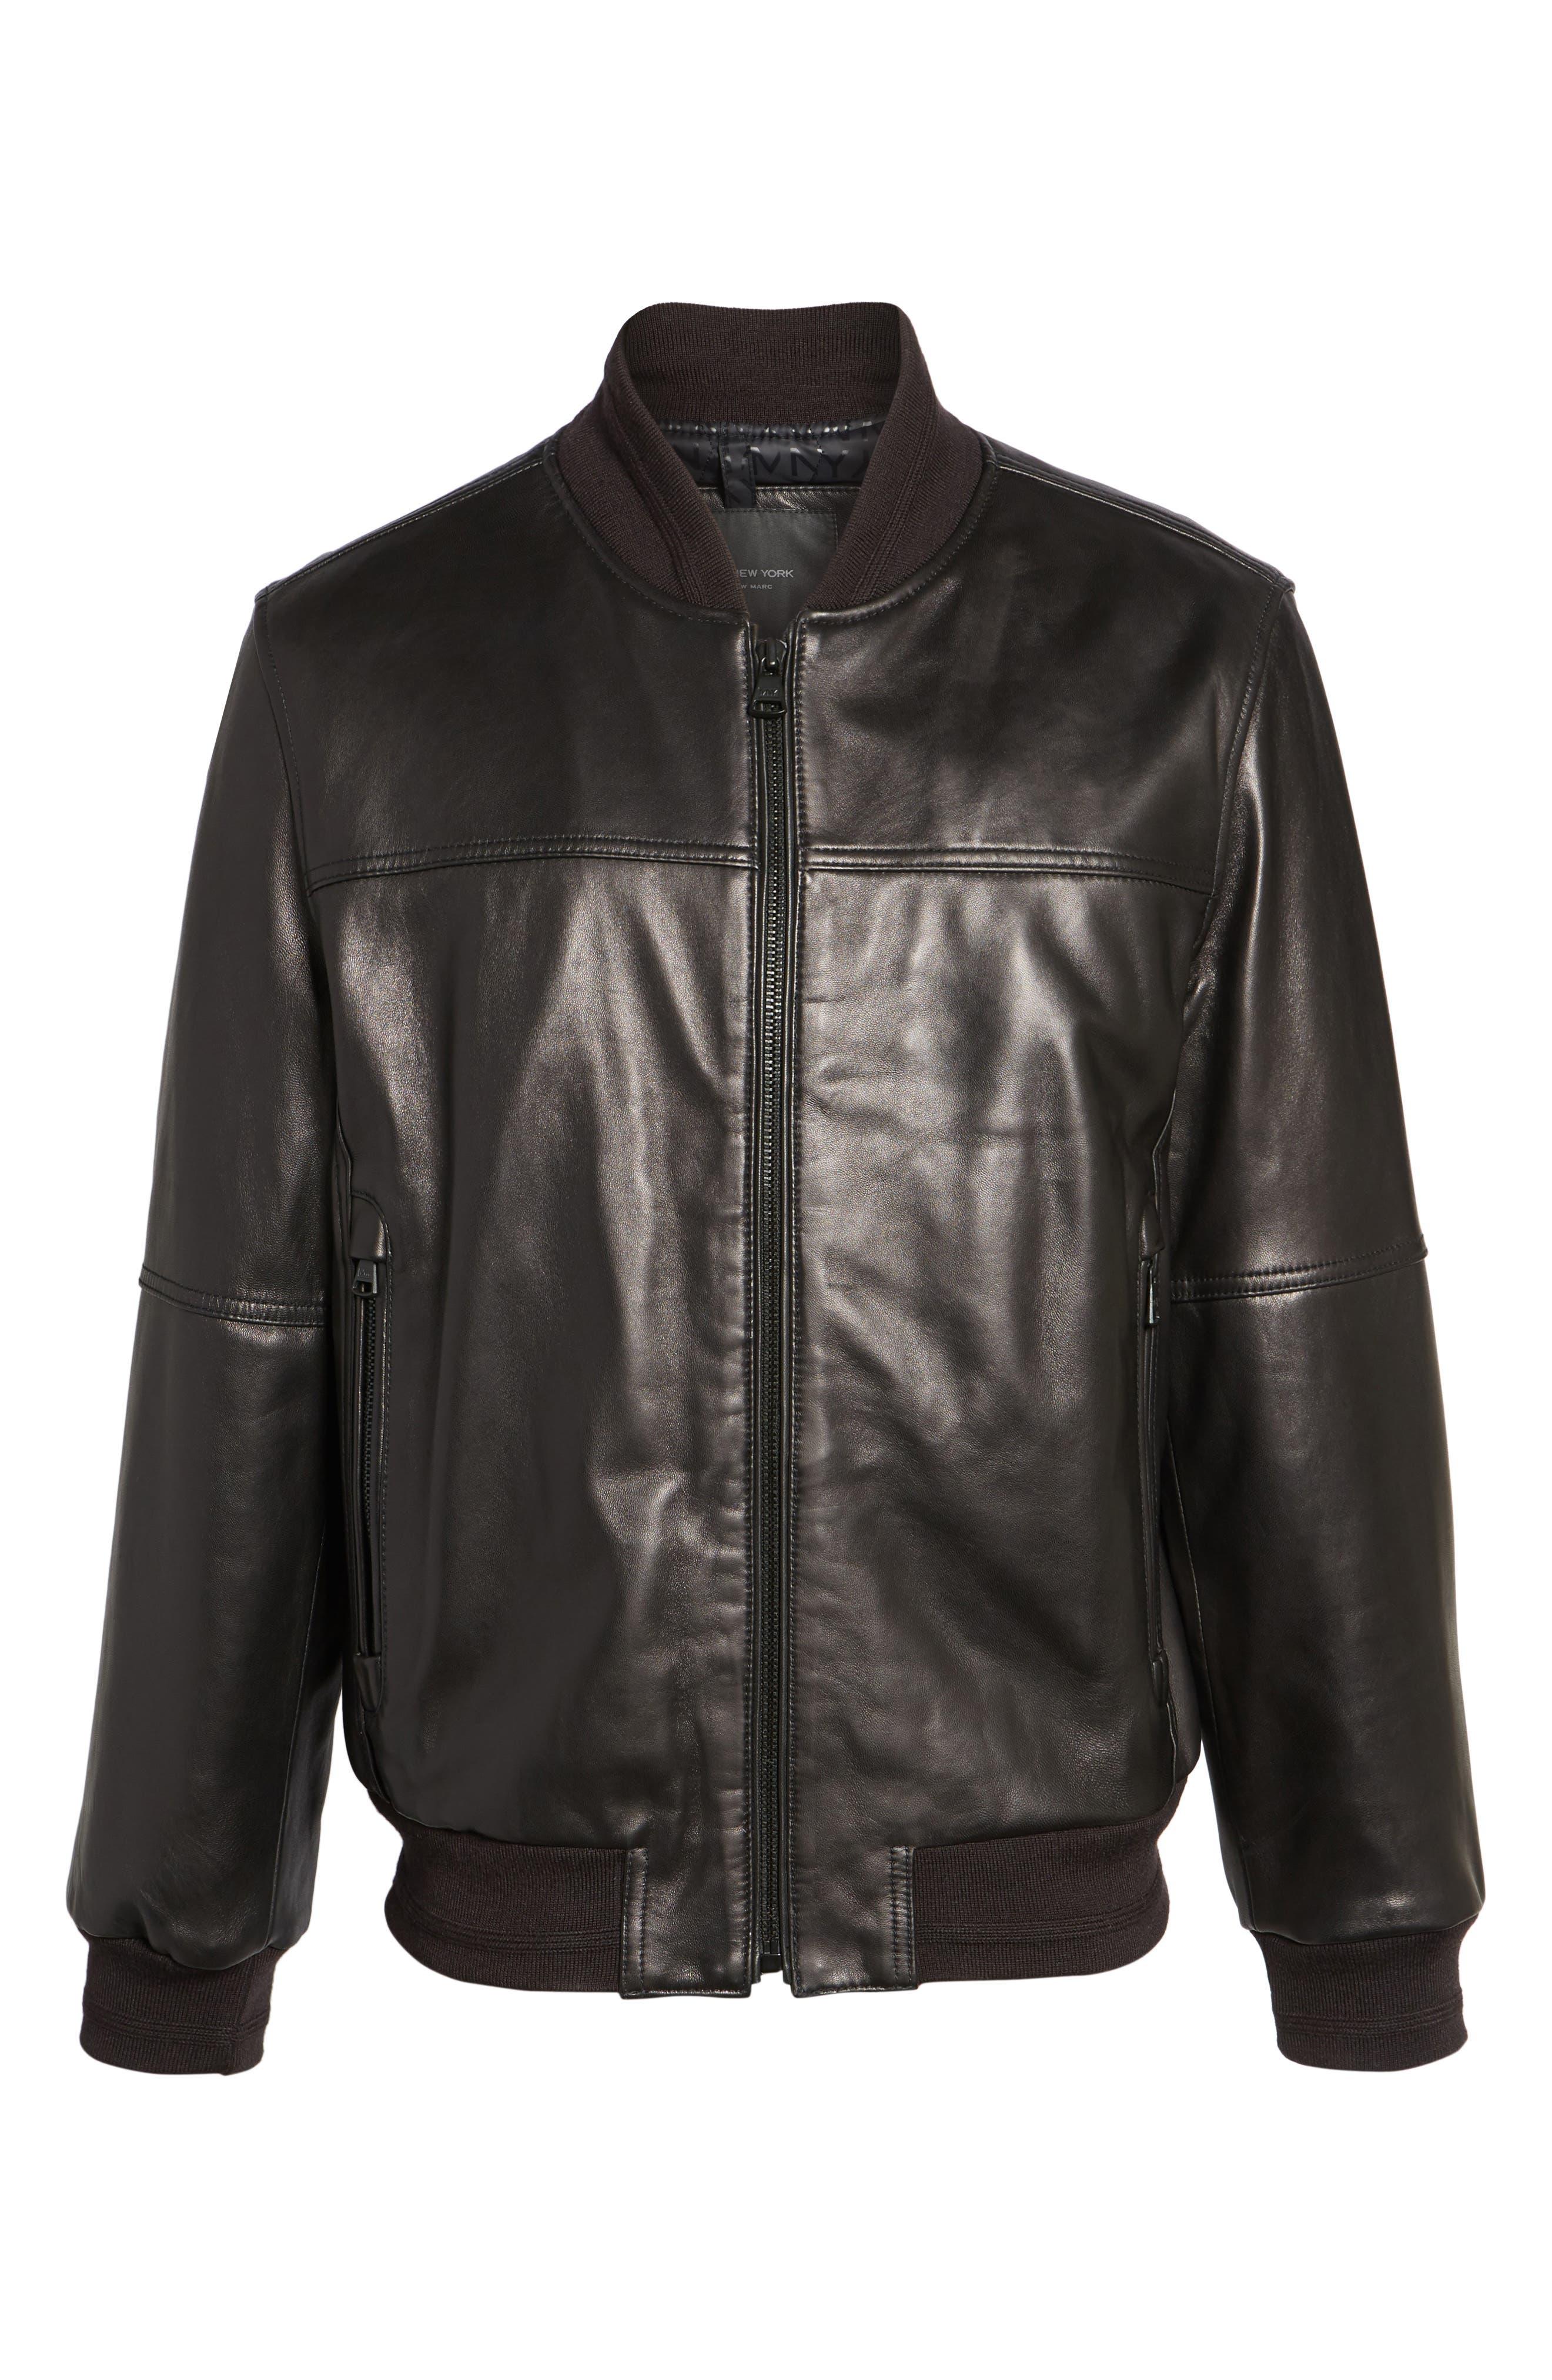 MARC NEW YORK, Summit Leather Jacket, Alternate thumbnail 5, color, BLACK